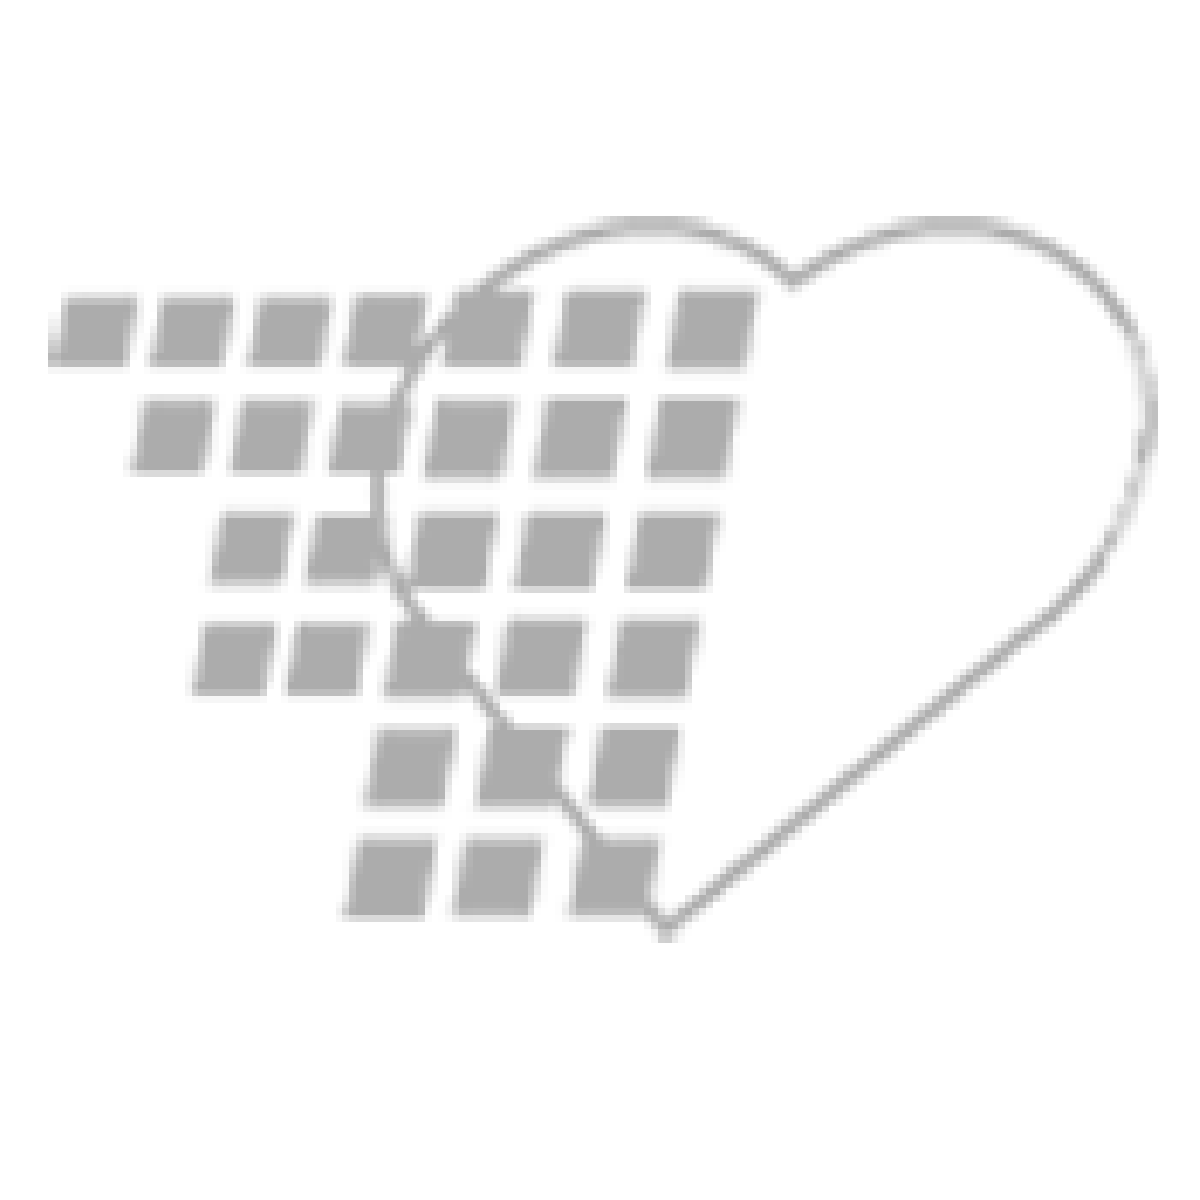 06-93-0054 - Demo Dose® Decadrn 4 mg - 100 Pills/Box